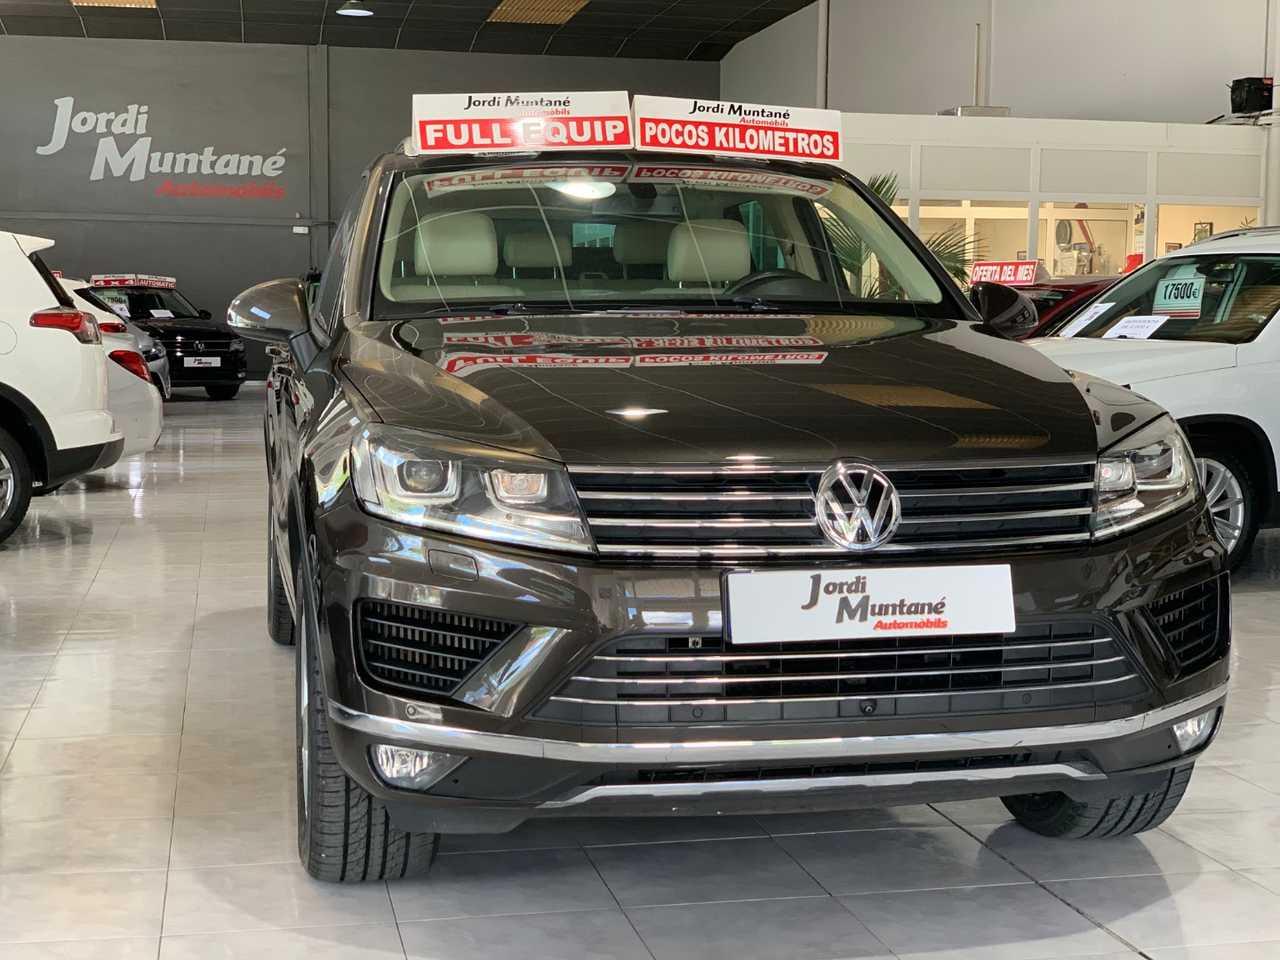 "Volkswagen Touareg 3.0 TDI 262cv V6 BMT Premium -. '' Tiptronic + 4x4 '' .- MUY CUIDADO  -. ""COCHE VENDIDO"".-  - Foto 1"